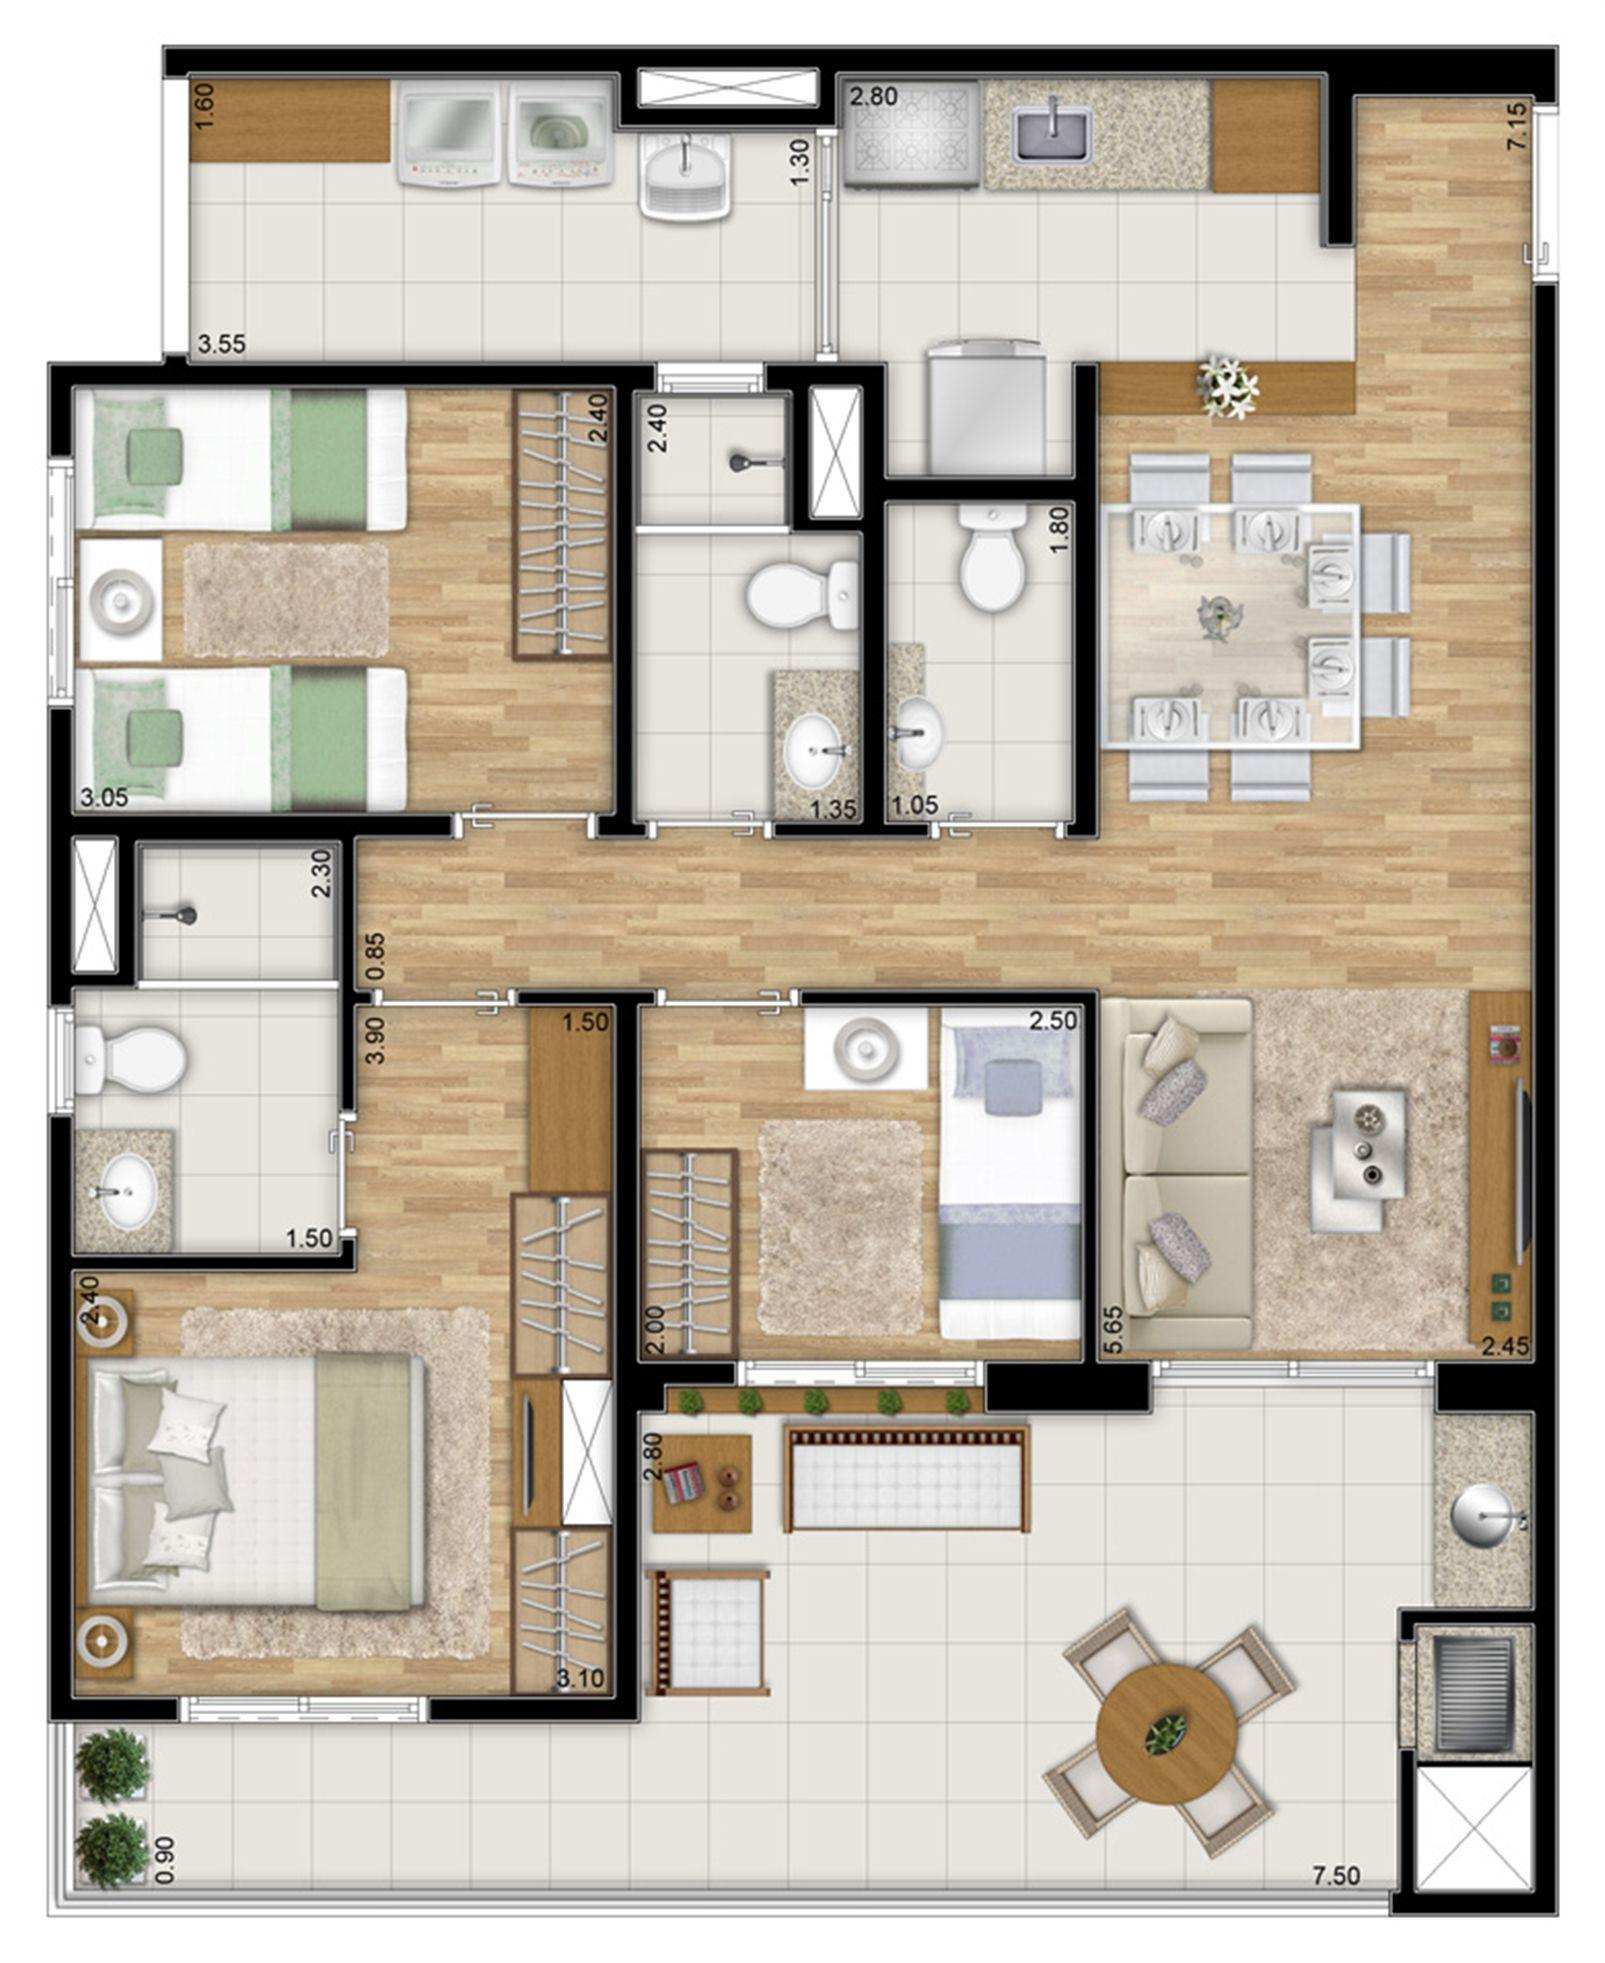 Planta tipo do apartamento de 87 m² privativos - 3 dorms. c 1 suíte   Varanda Ipiranga – Apartamentono  Ipiranga - São Paulo - São Paulo